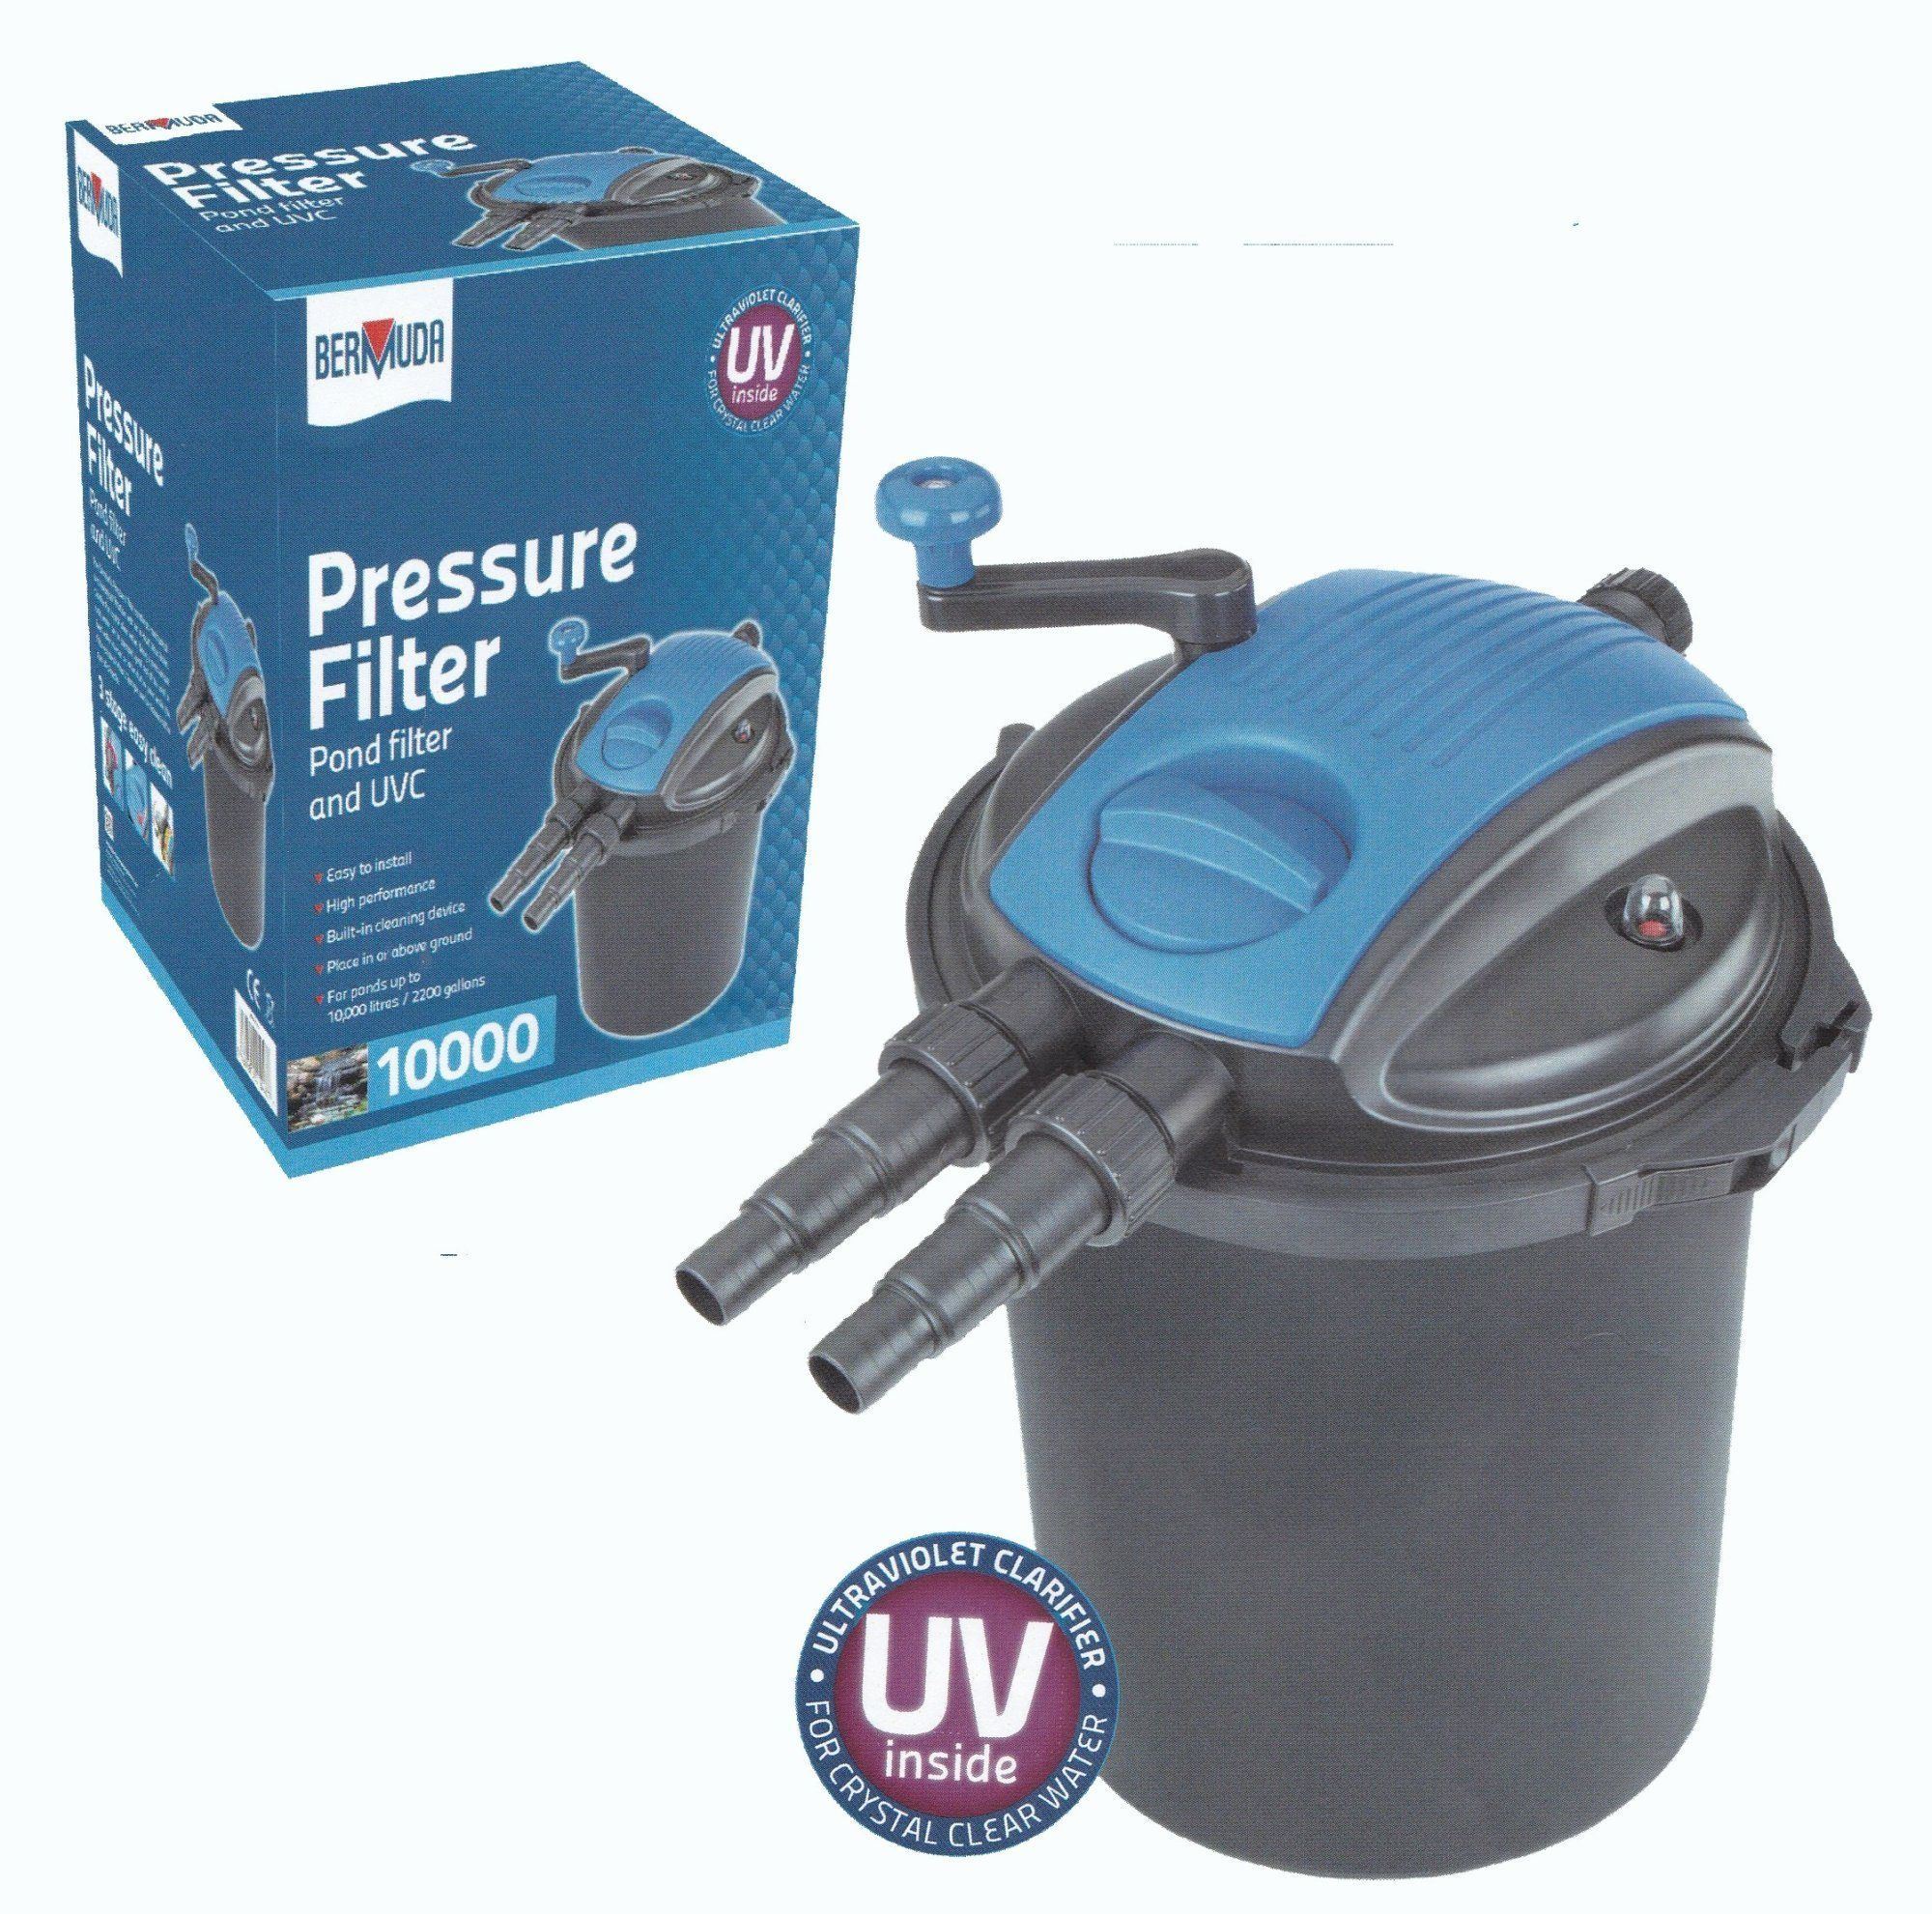 Bermuda Pressure Filter 15000 Pond filters, Filters, Pond